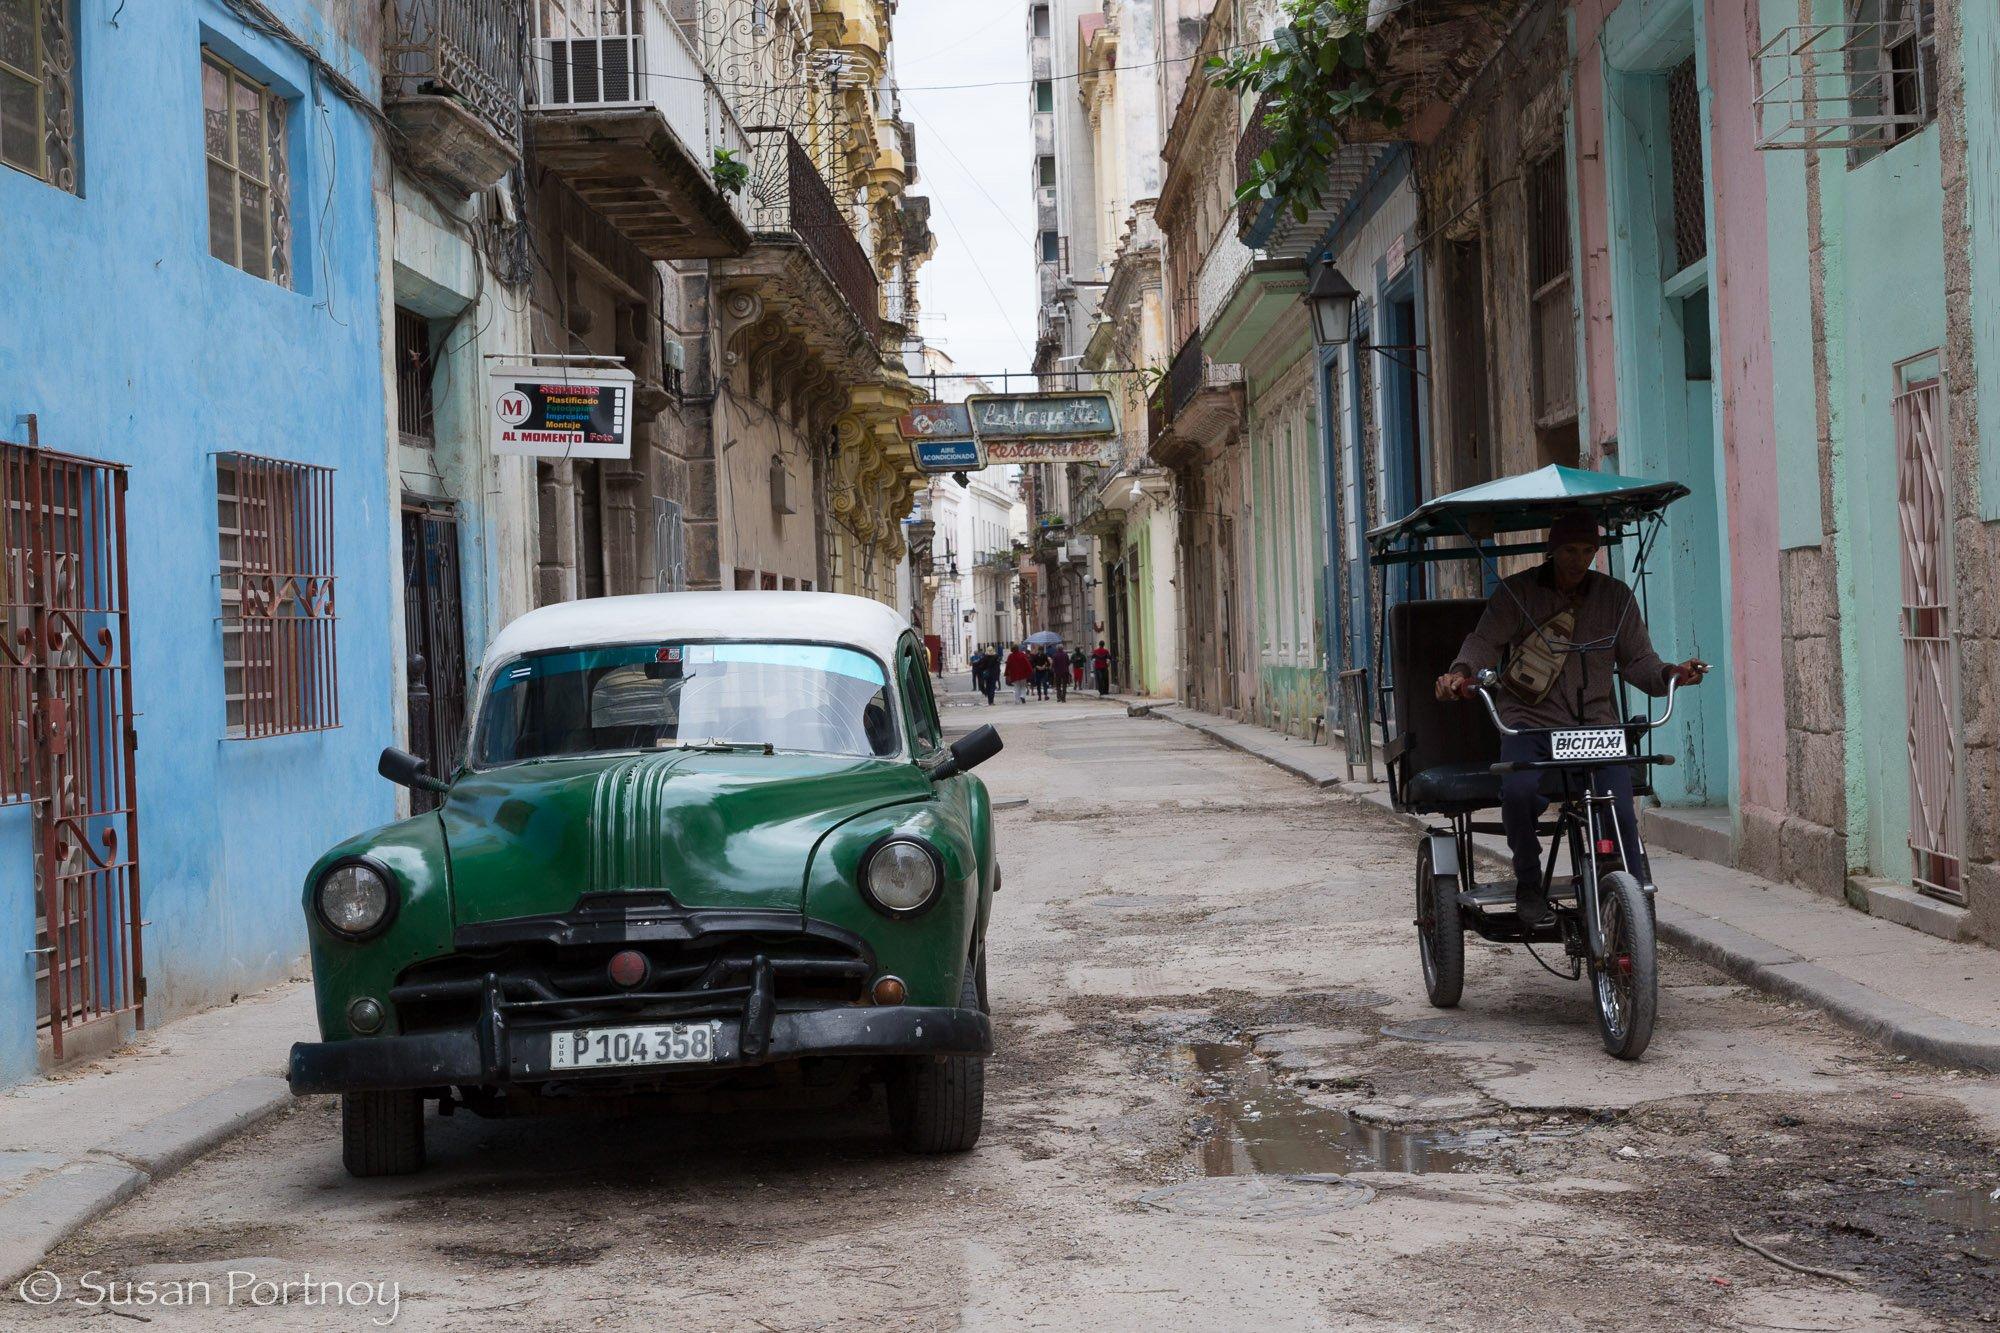 Green classic car in Havana, Cuba